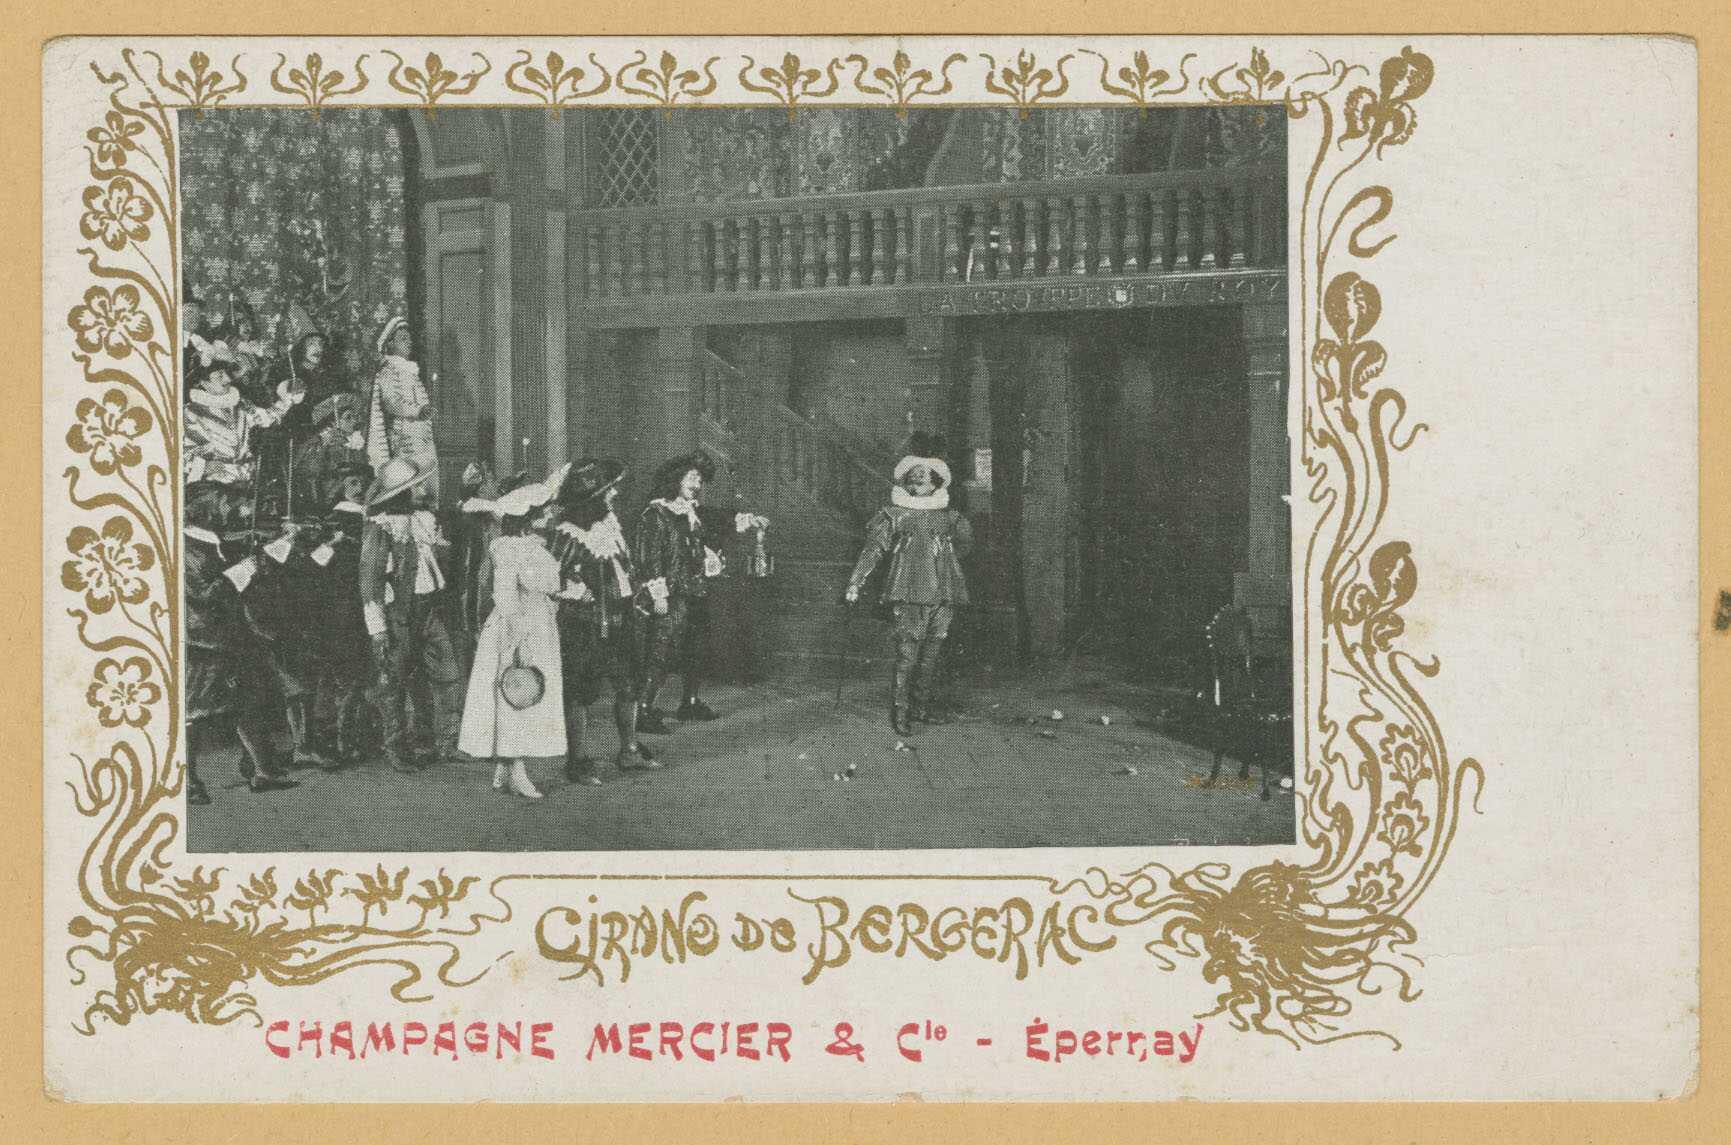 ÉPERNAY. Cirano de Bergerac. Champagne Mercier & Cie - Épernay.